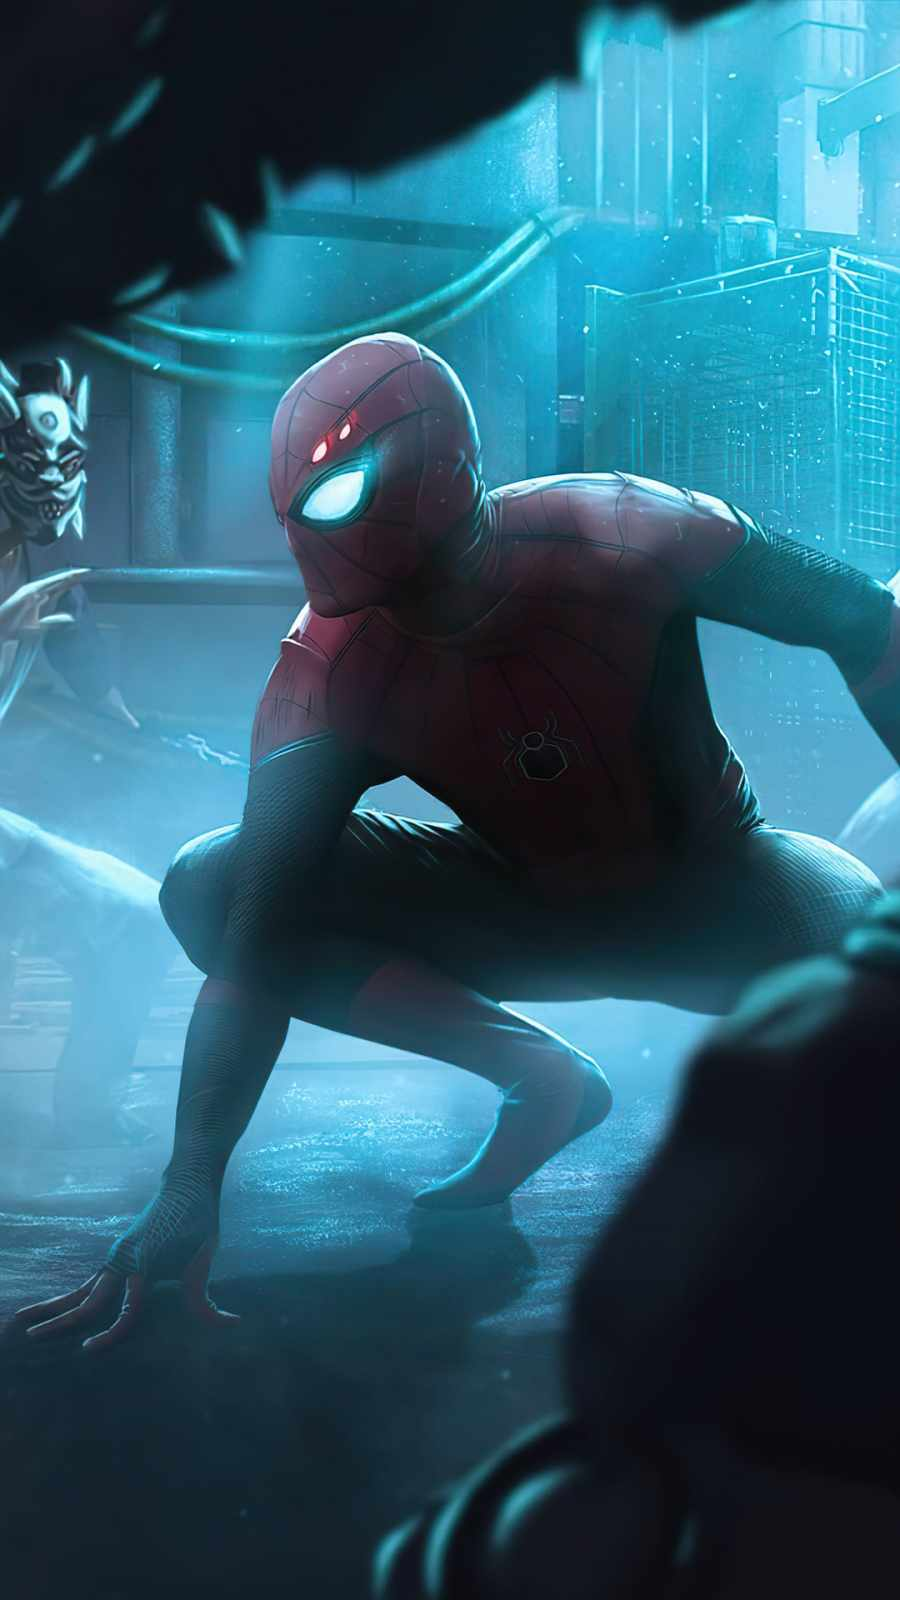 Spiderman Neon Glowing World